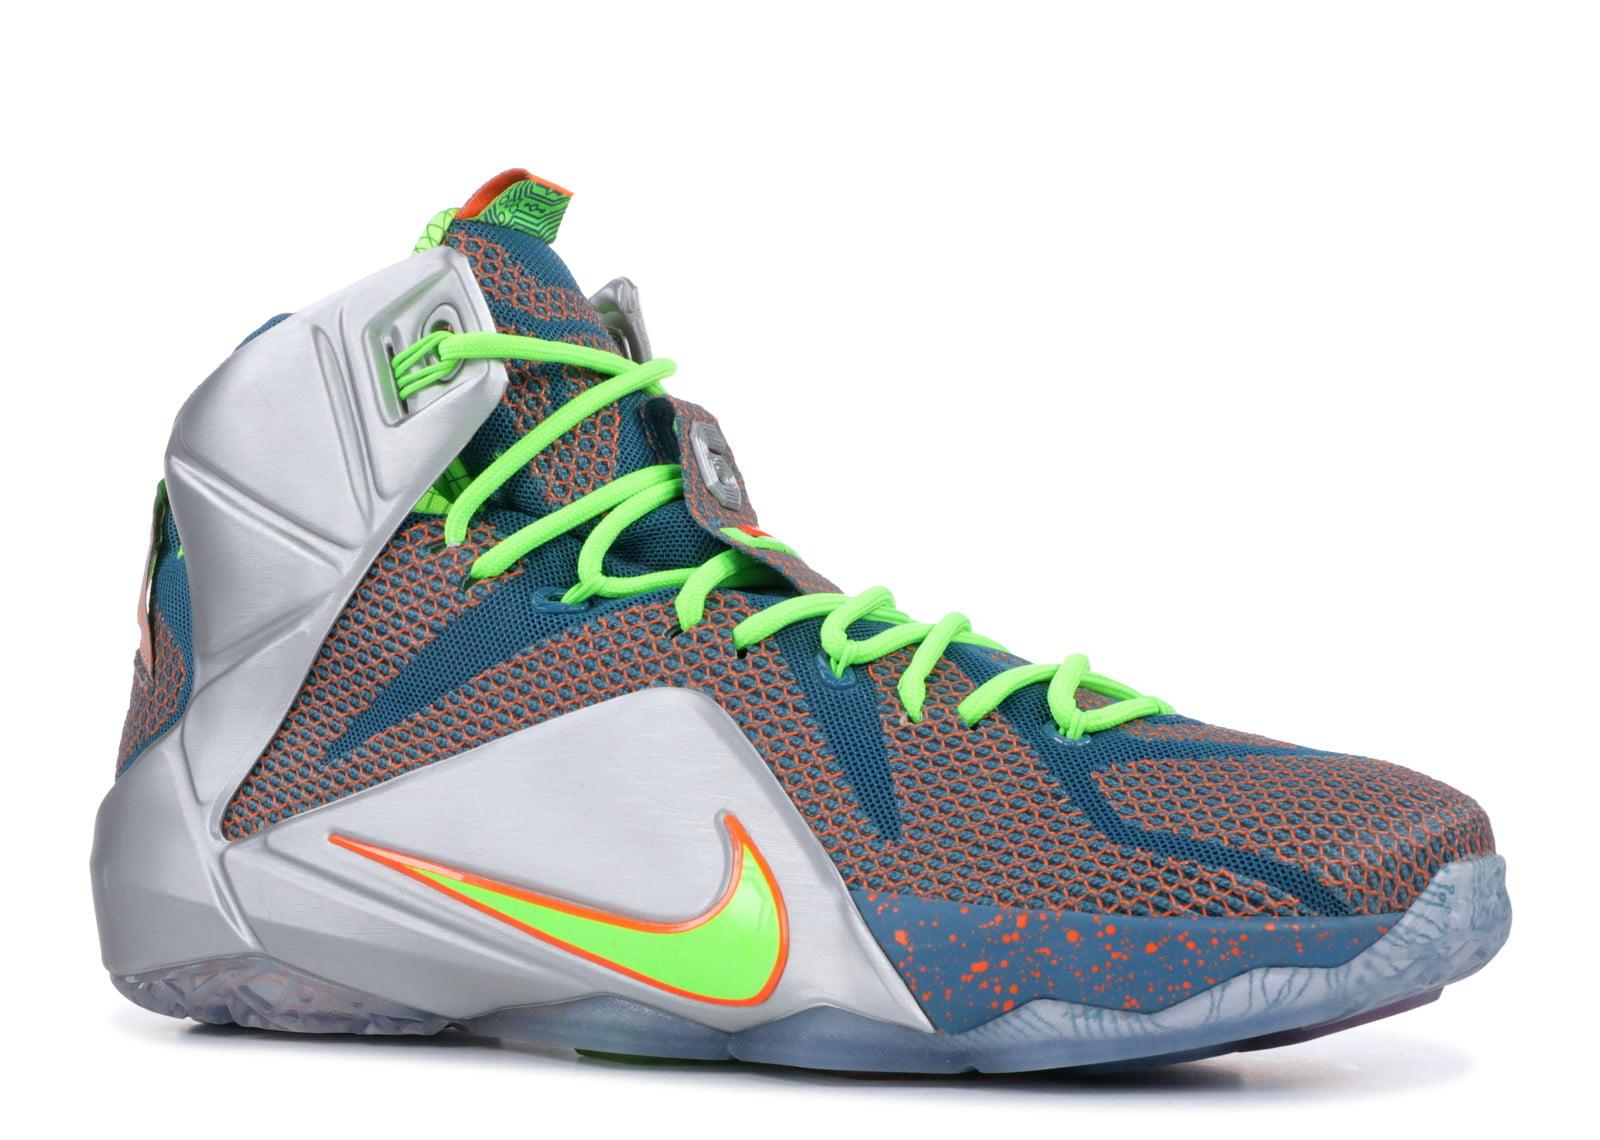 cd915bb694e31 Nike - Men - Lebron 12 Prm 'Trillion Dollar Man' - 705410-430 - Size 9